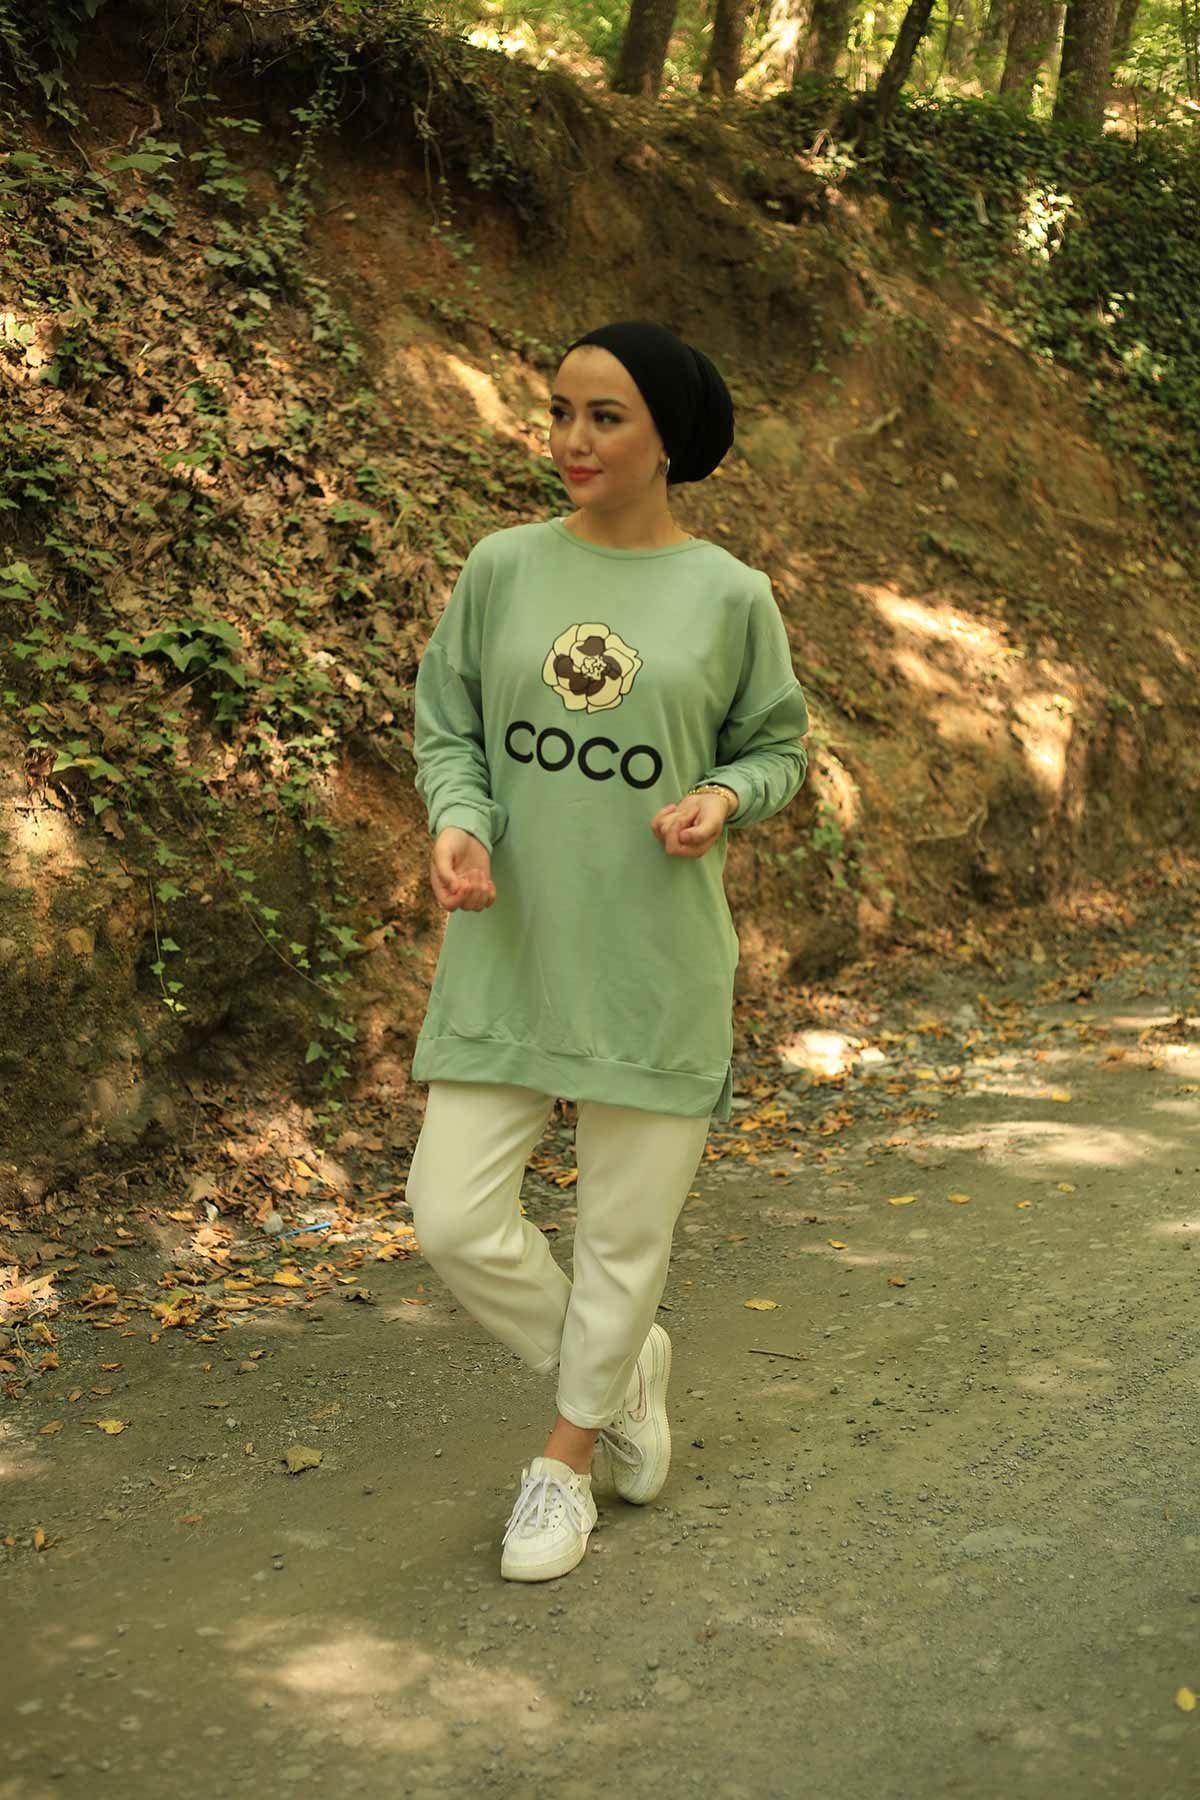 Coco Baskılı Sweat - Mint